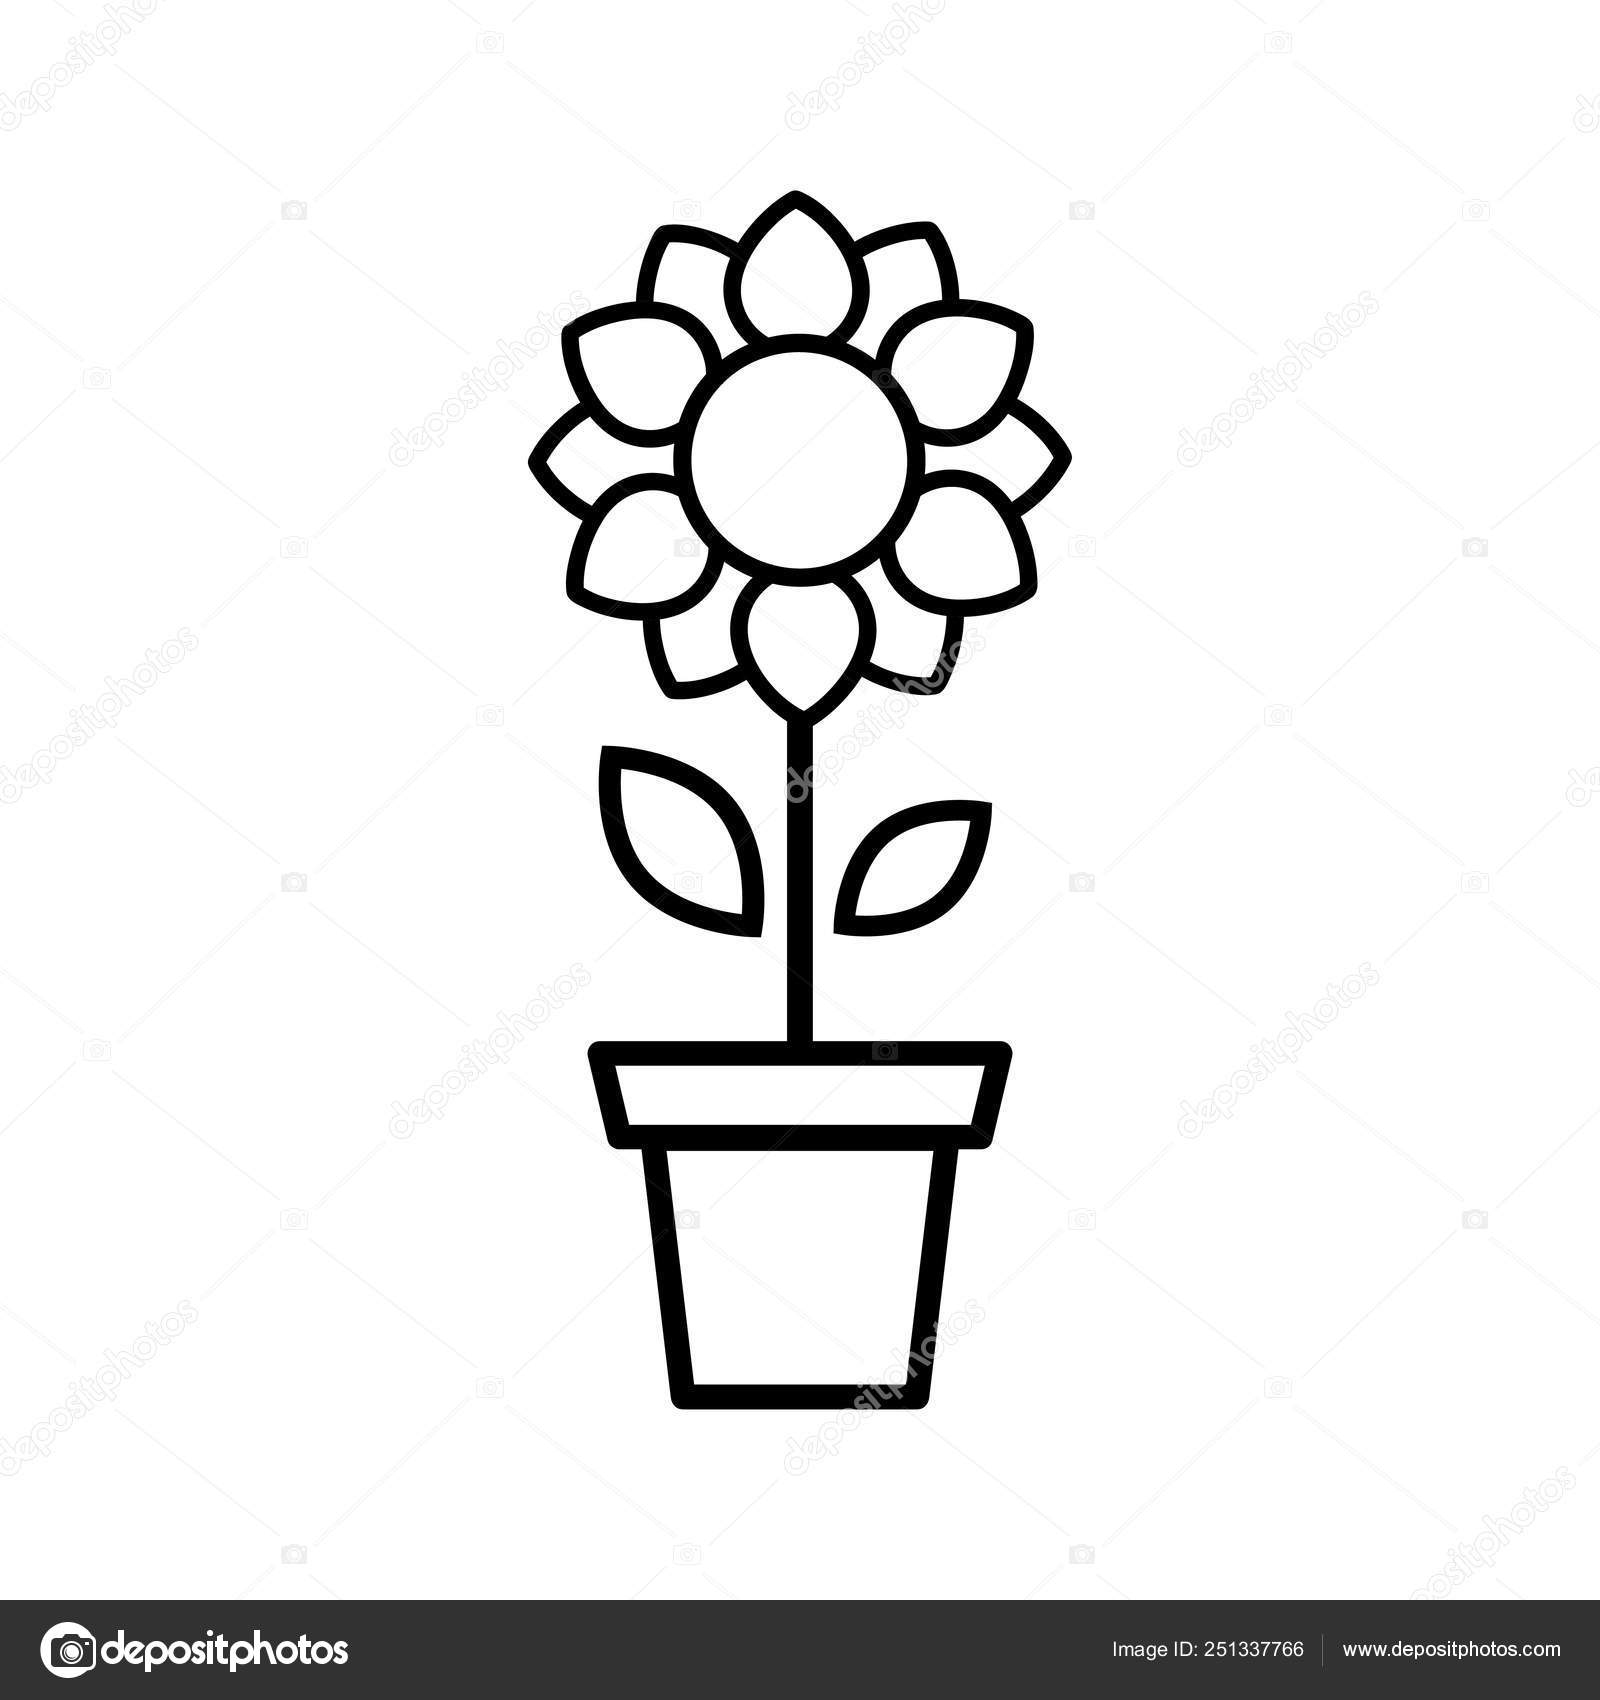 Vector Image Cartoon Cute Sunflower Vector Outline Pot Stock Vector C Julia January 251337766 Giant rose petal template free. vector image cartoon cute sunflower vector outline pot stock vector c julia january 251337766